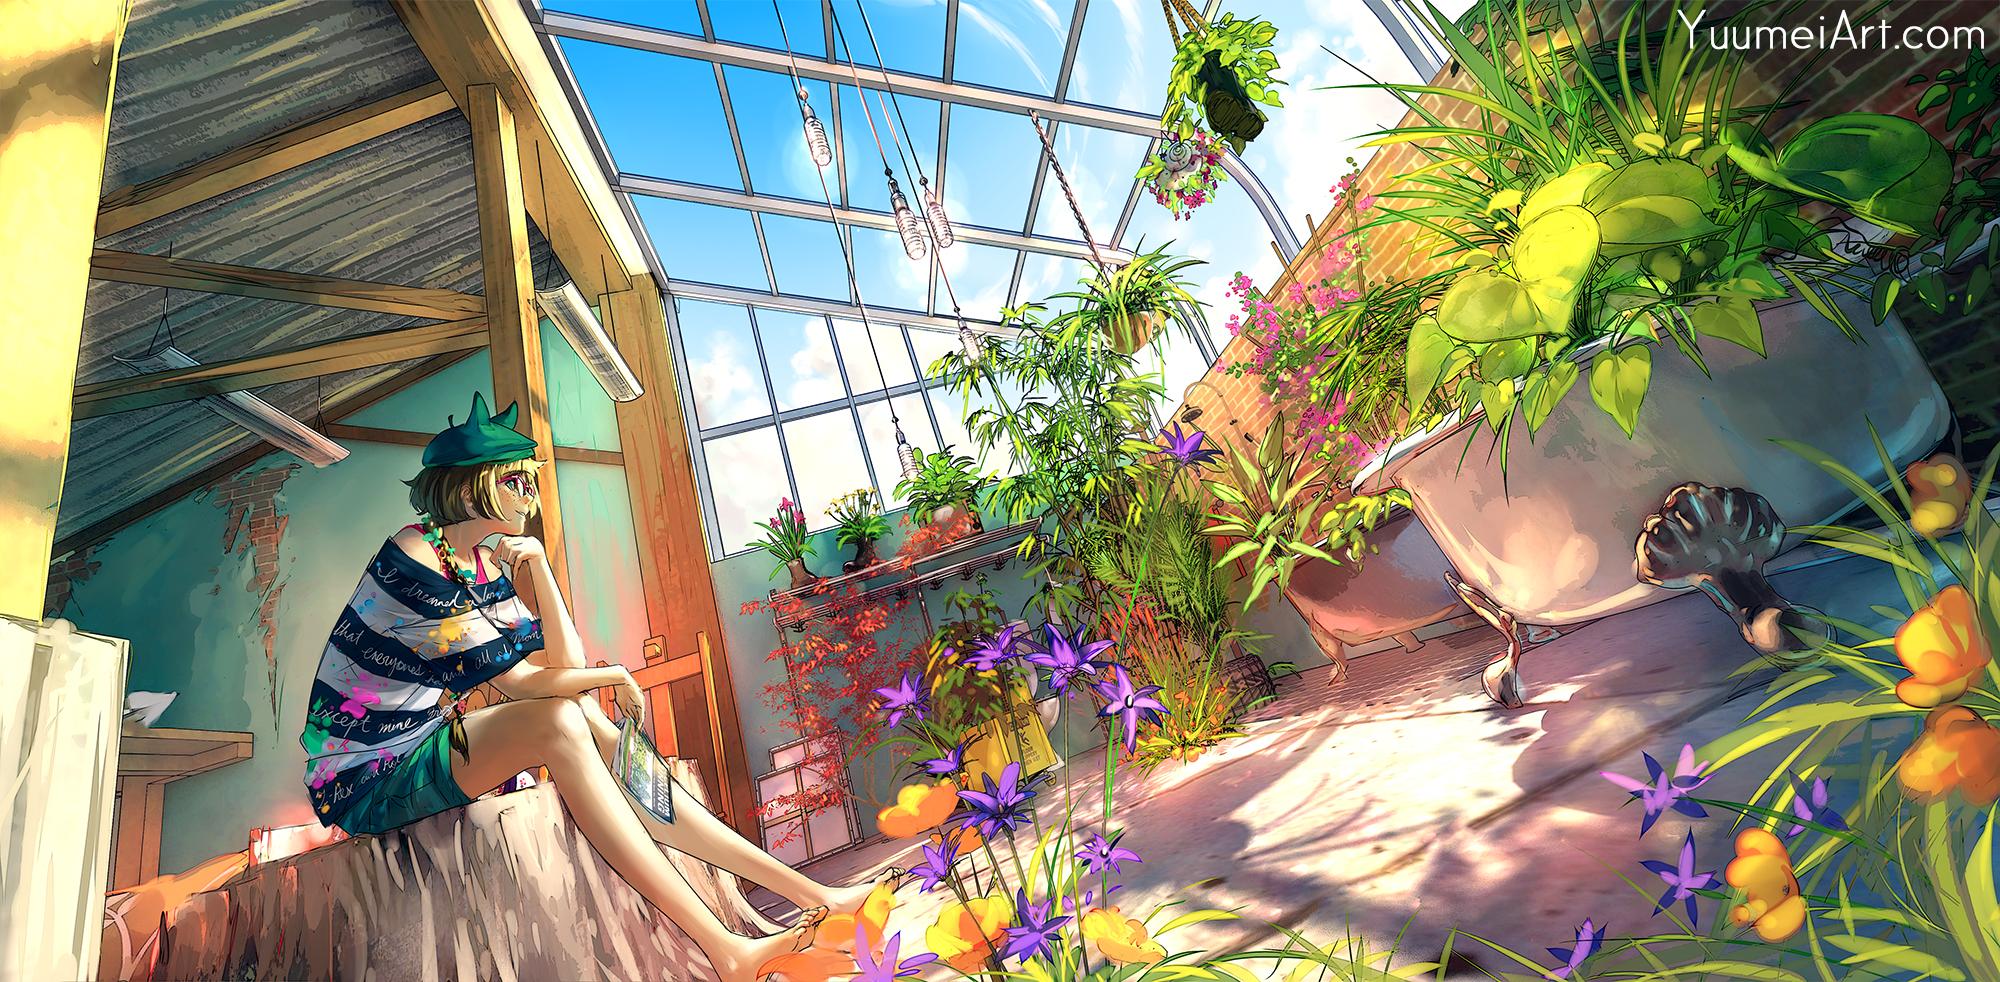 Cocoa from Fisheye Placebo sitting in her warehouse-turned-art-studio-turned-greenshouse.